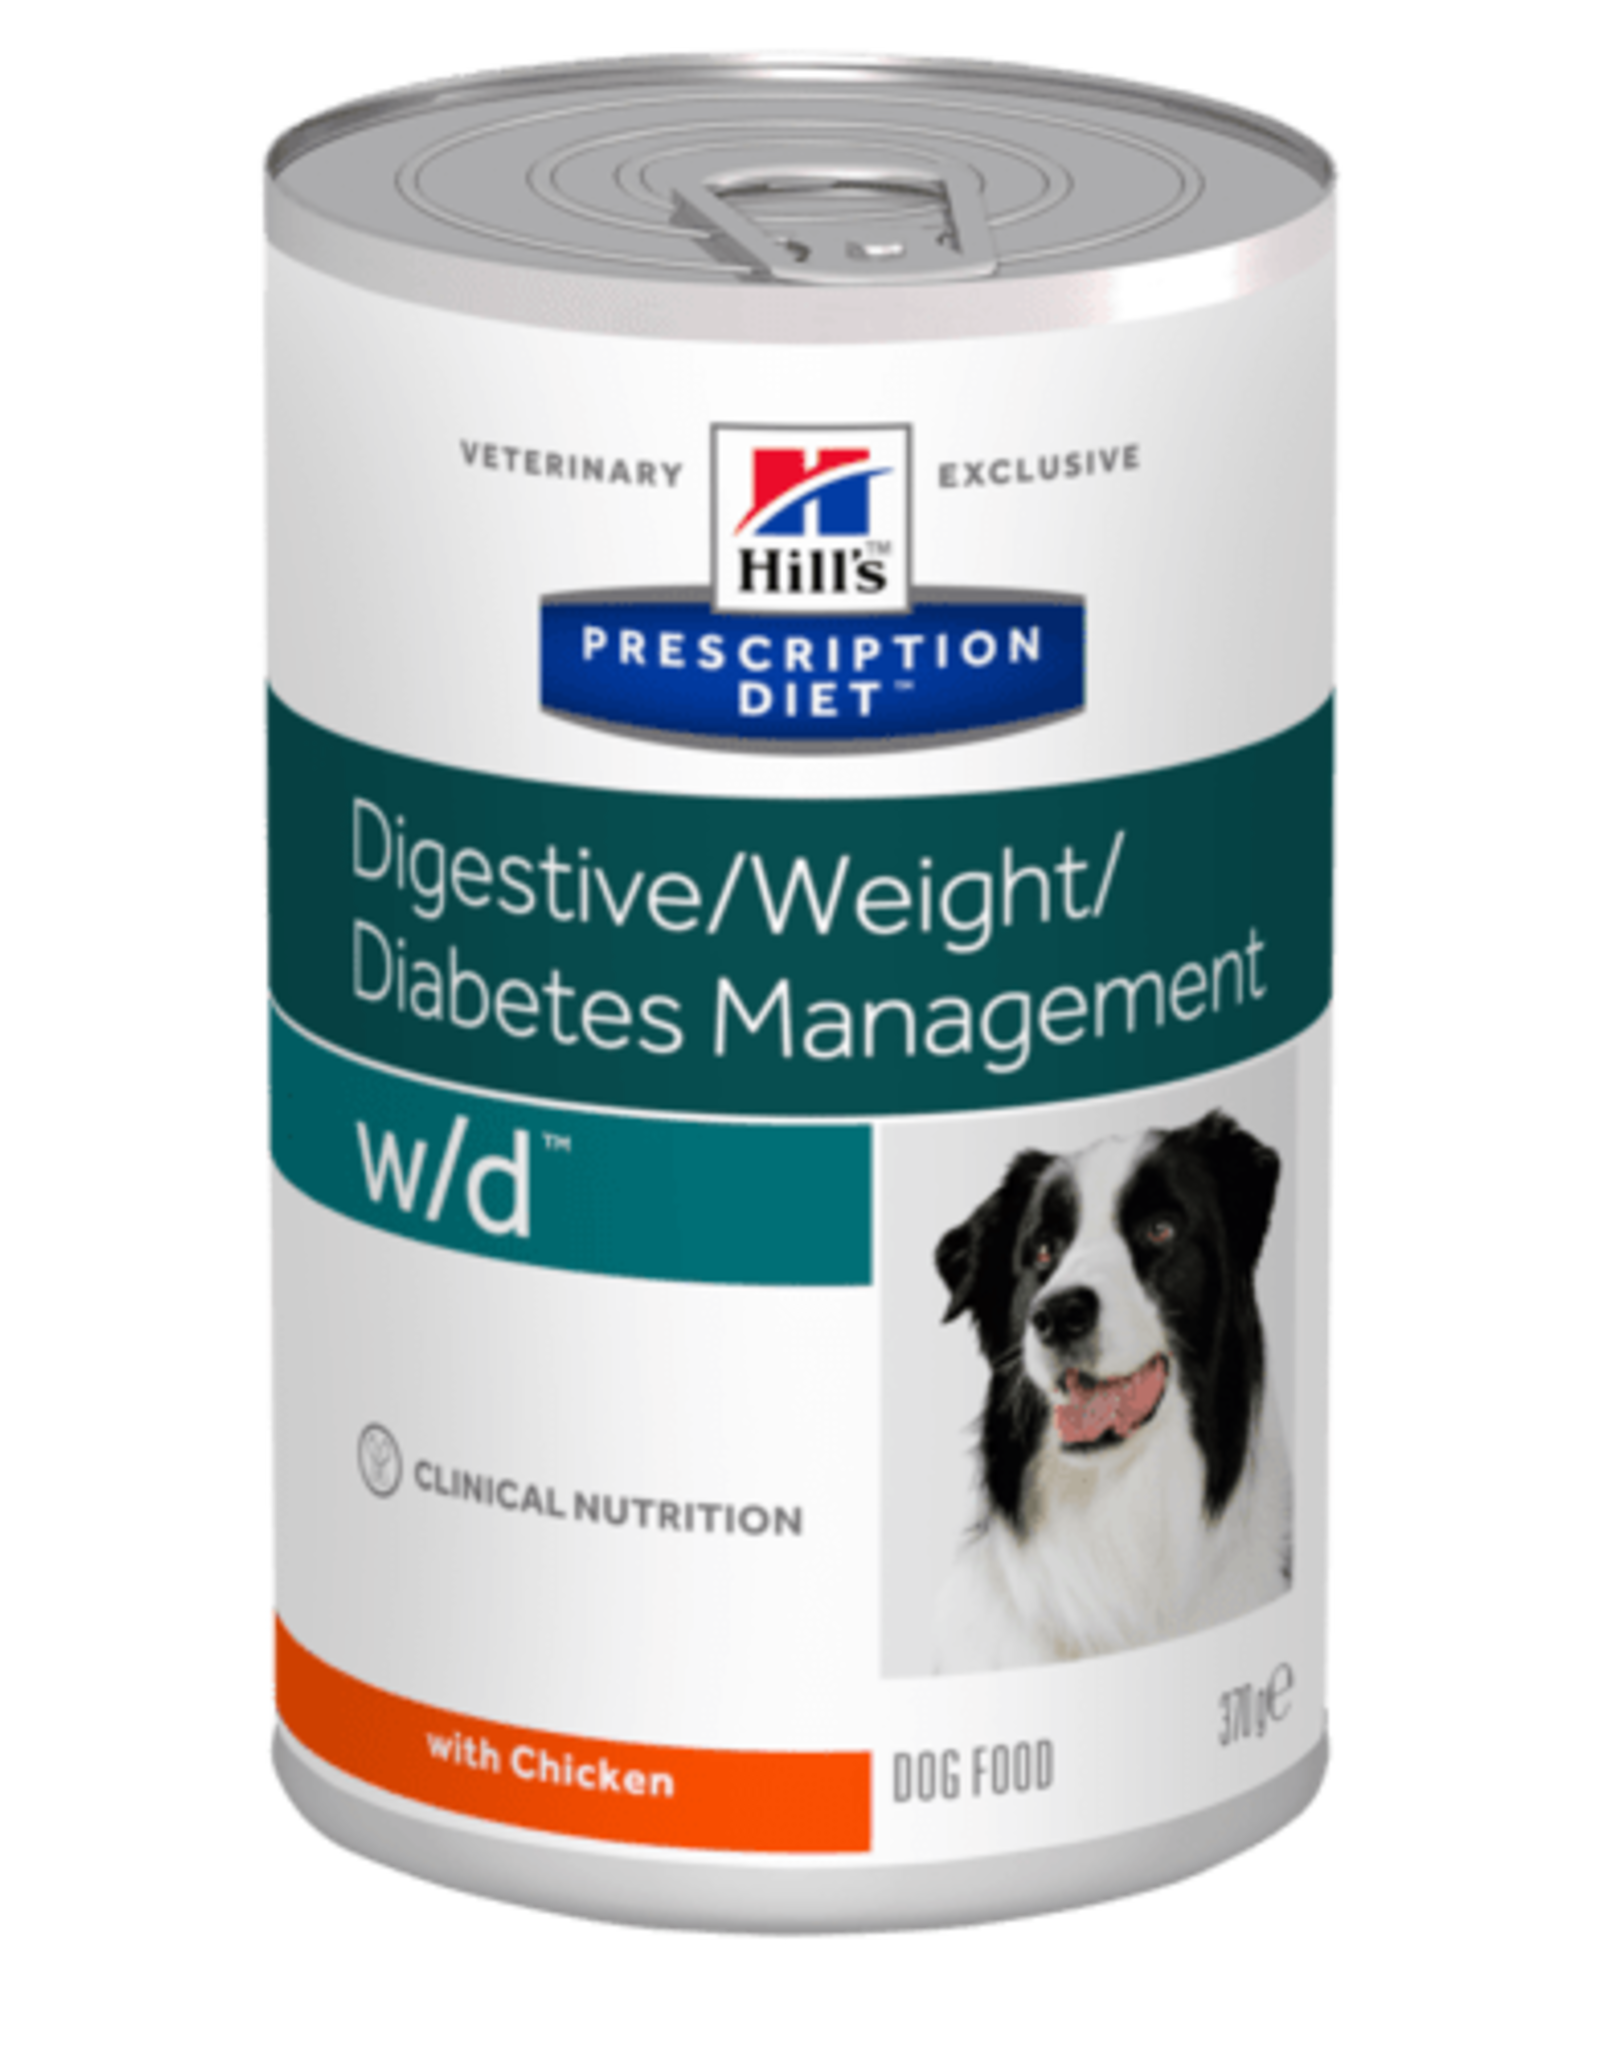 Hill's Hill's Prescription Diet W/d Dog 12x370gr